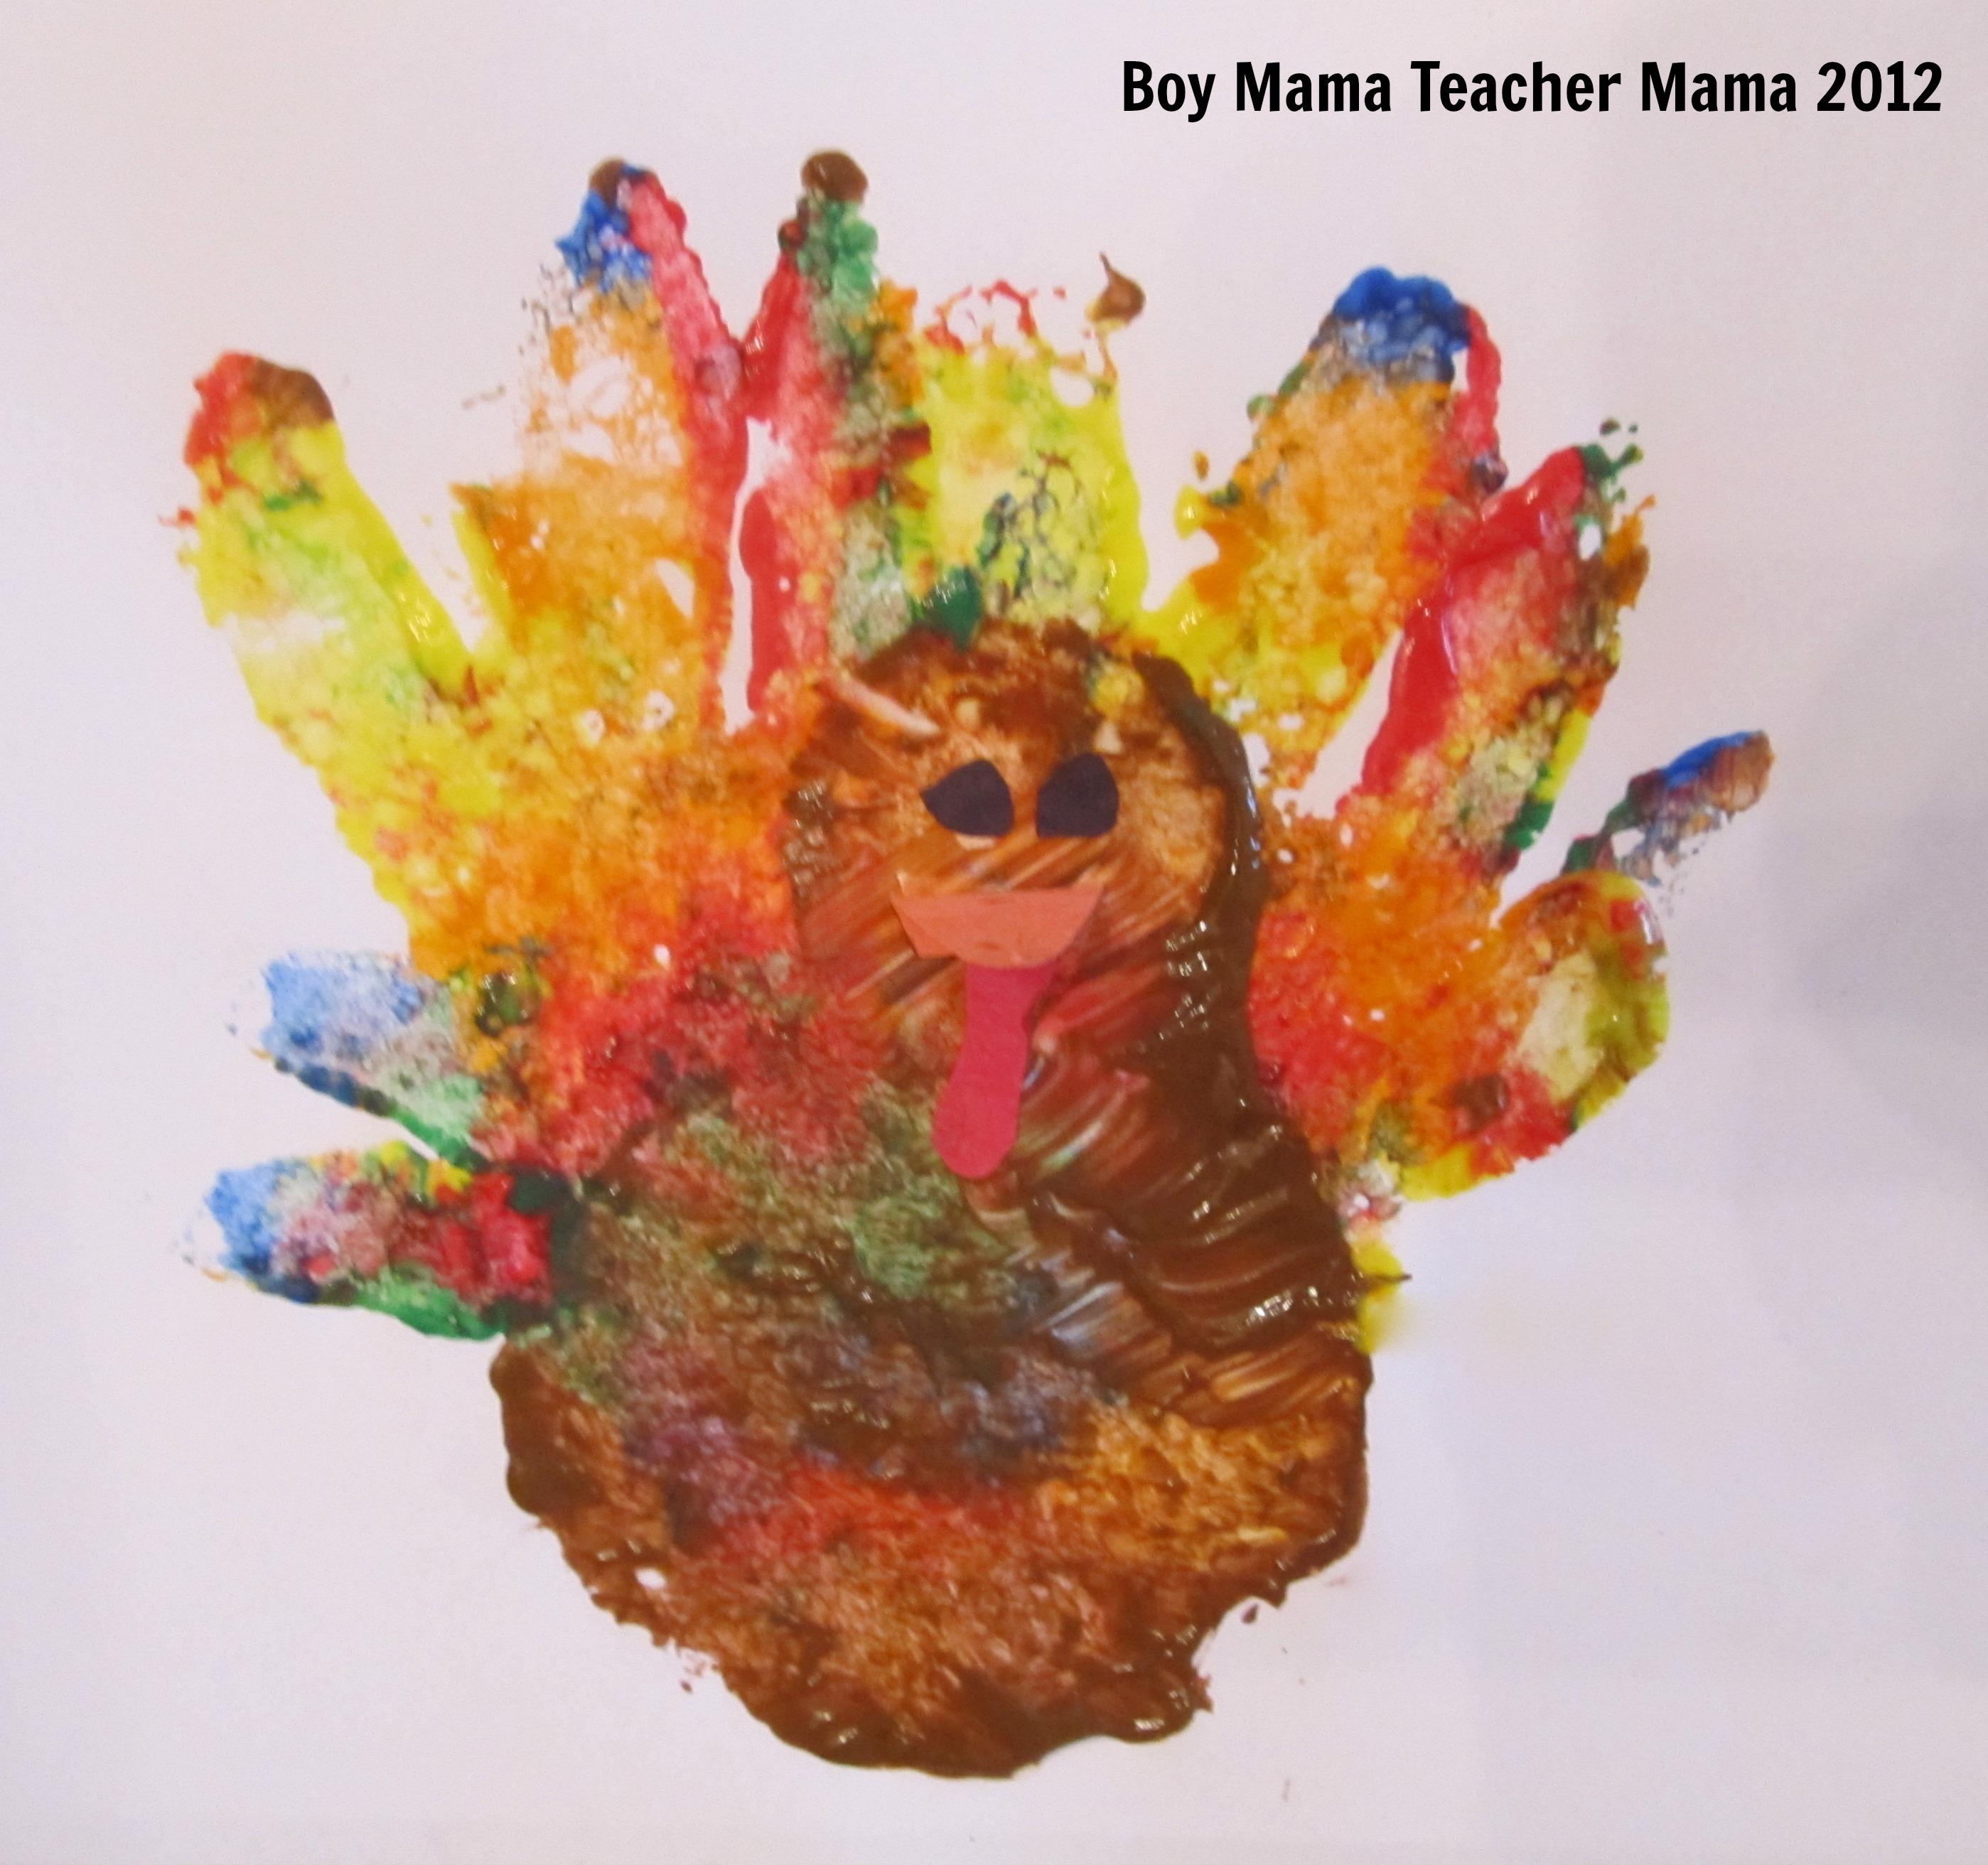 Boy Mama Handprint Turkeys Without The Mess Boy Mama Teacher Mama